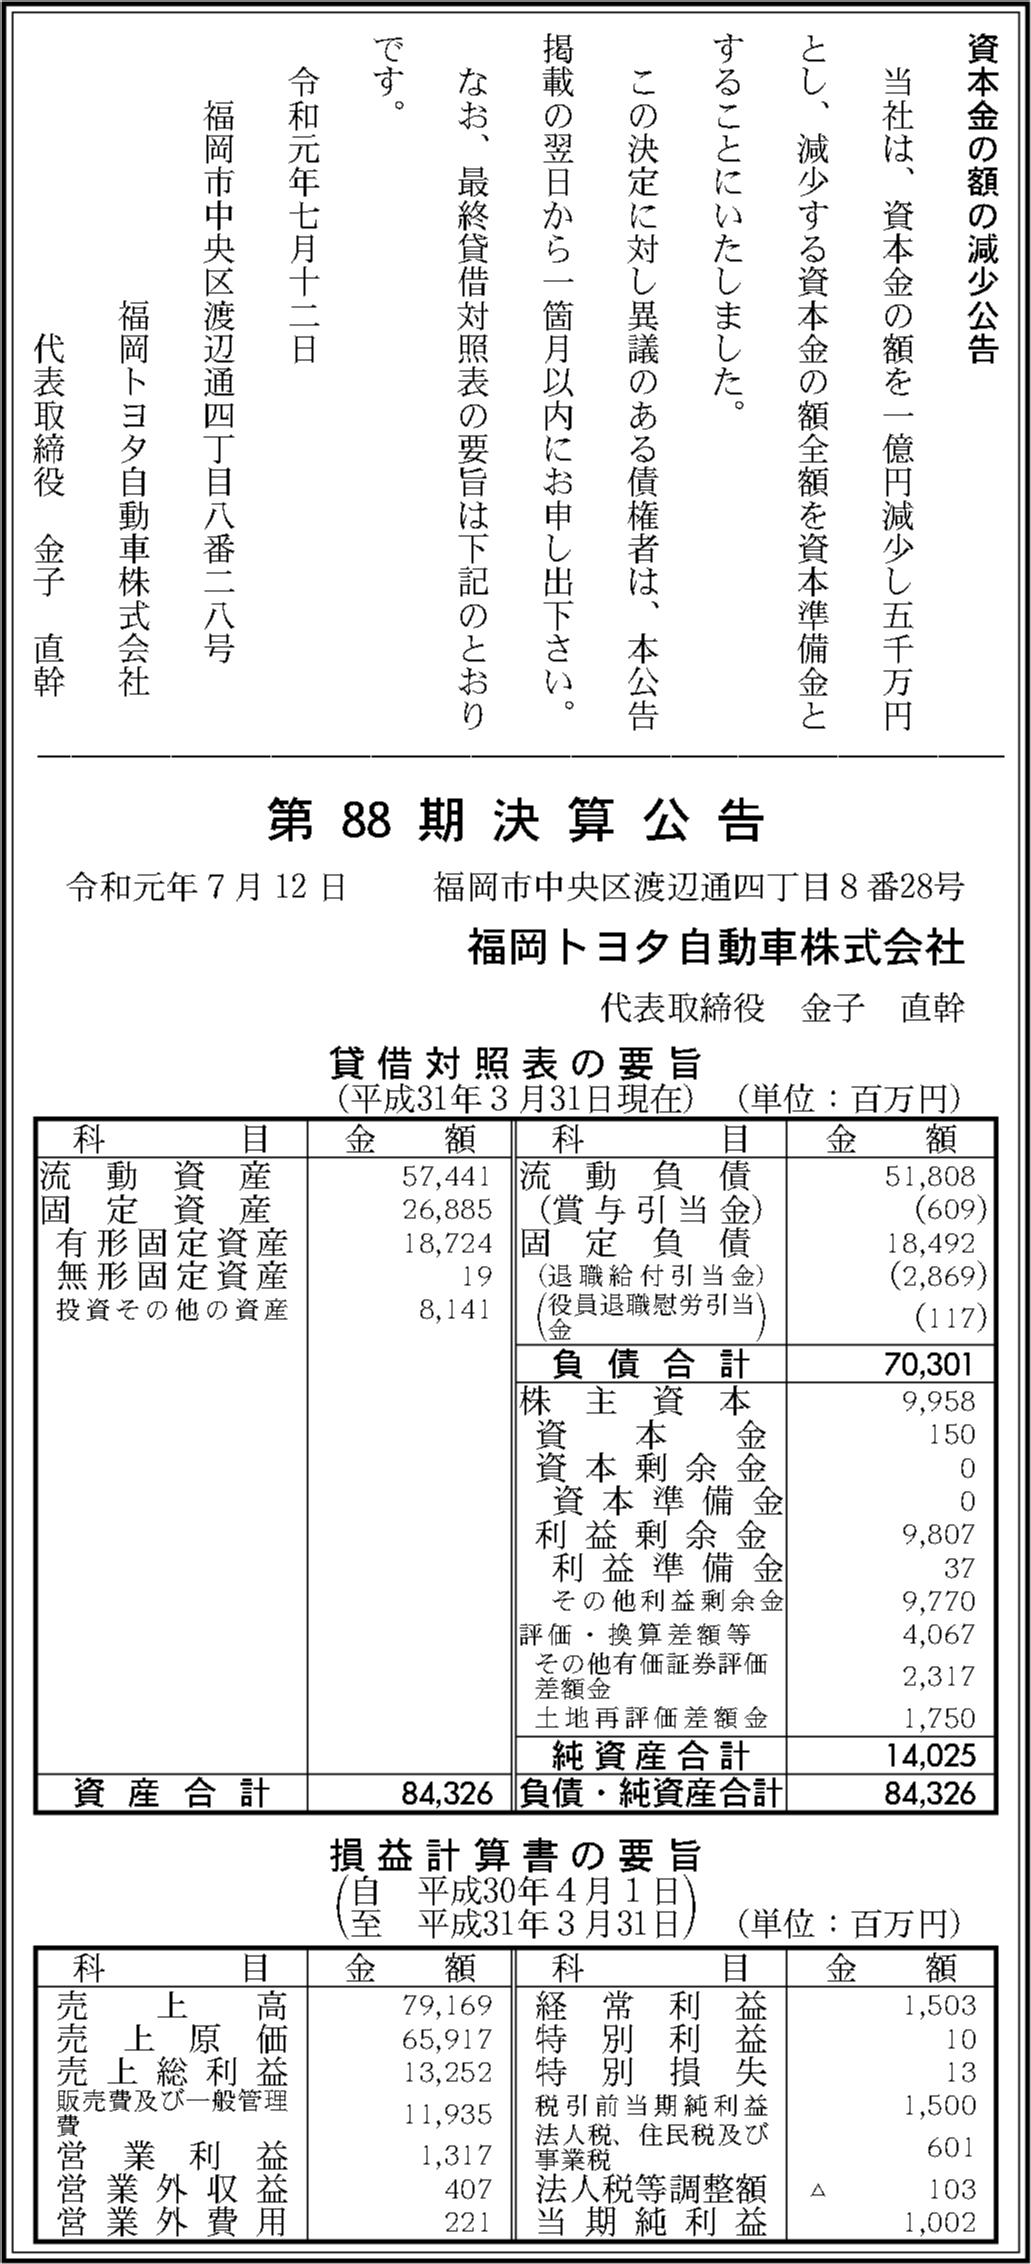 0096 266f3baa531d8ec7a2f833f2ebd7001f993cdd71b4f79559e7ba8189cb5d86172b2f764aa379d704bf053f16207762138ad0d4ad95da8ca7bba9f44cd8dac8f7 03